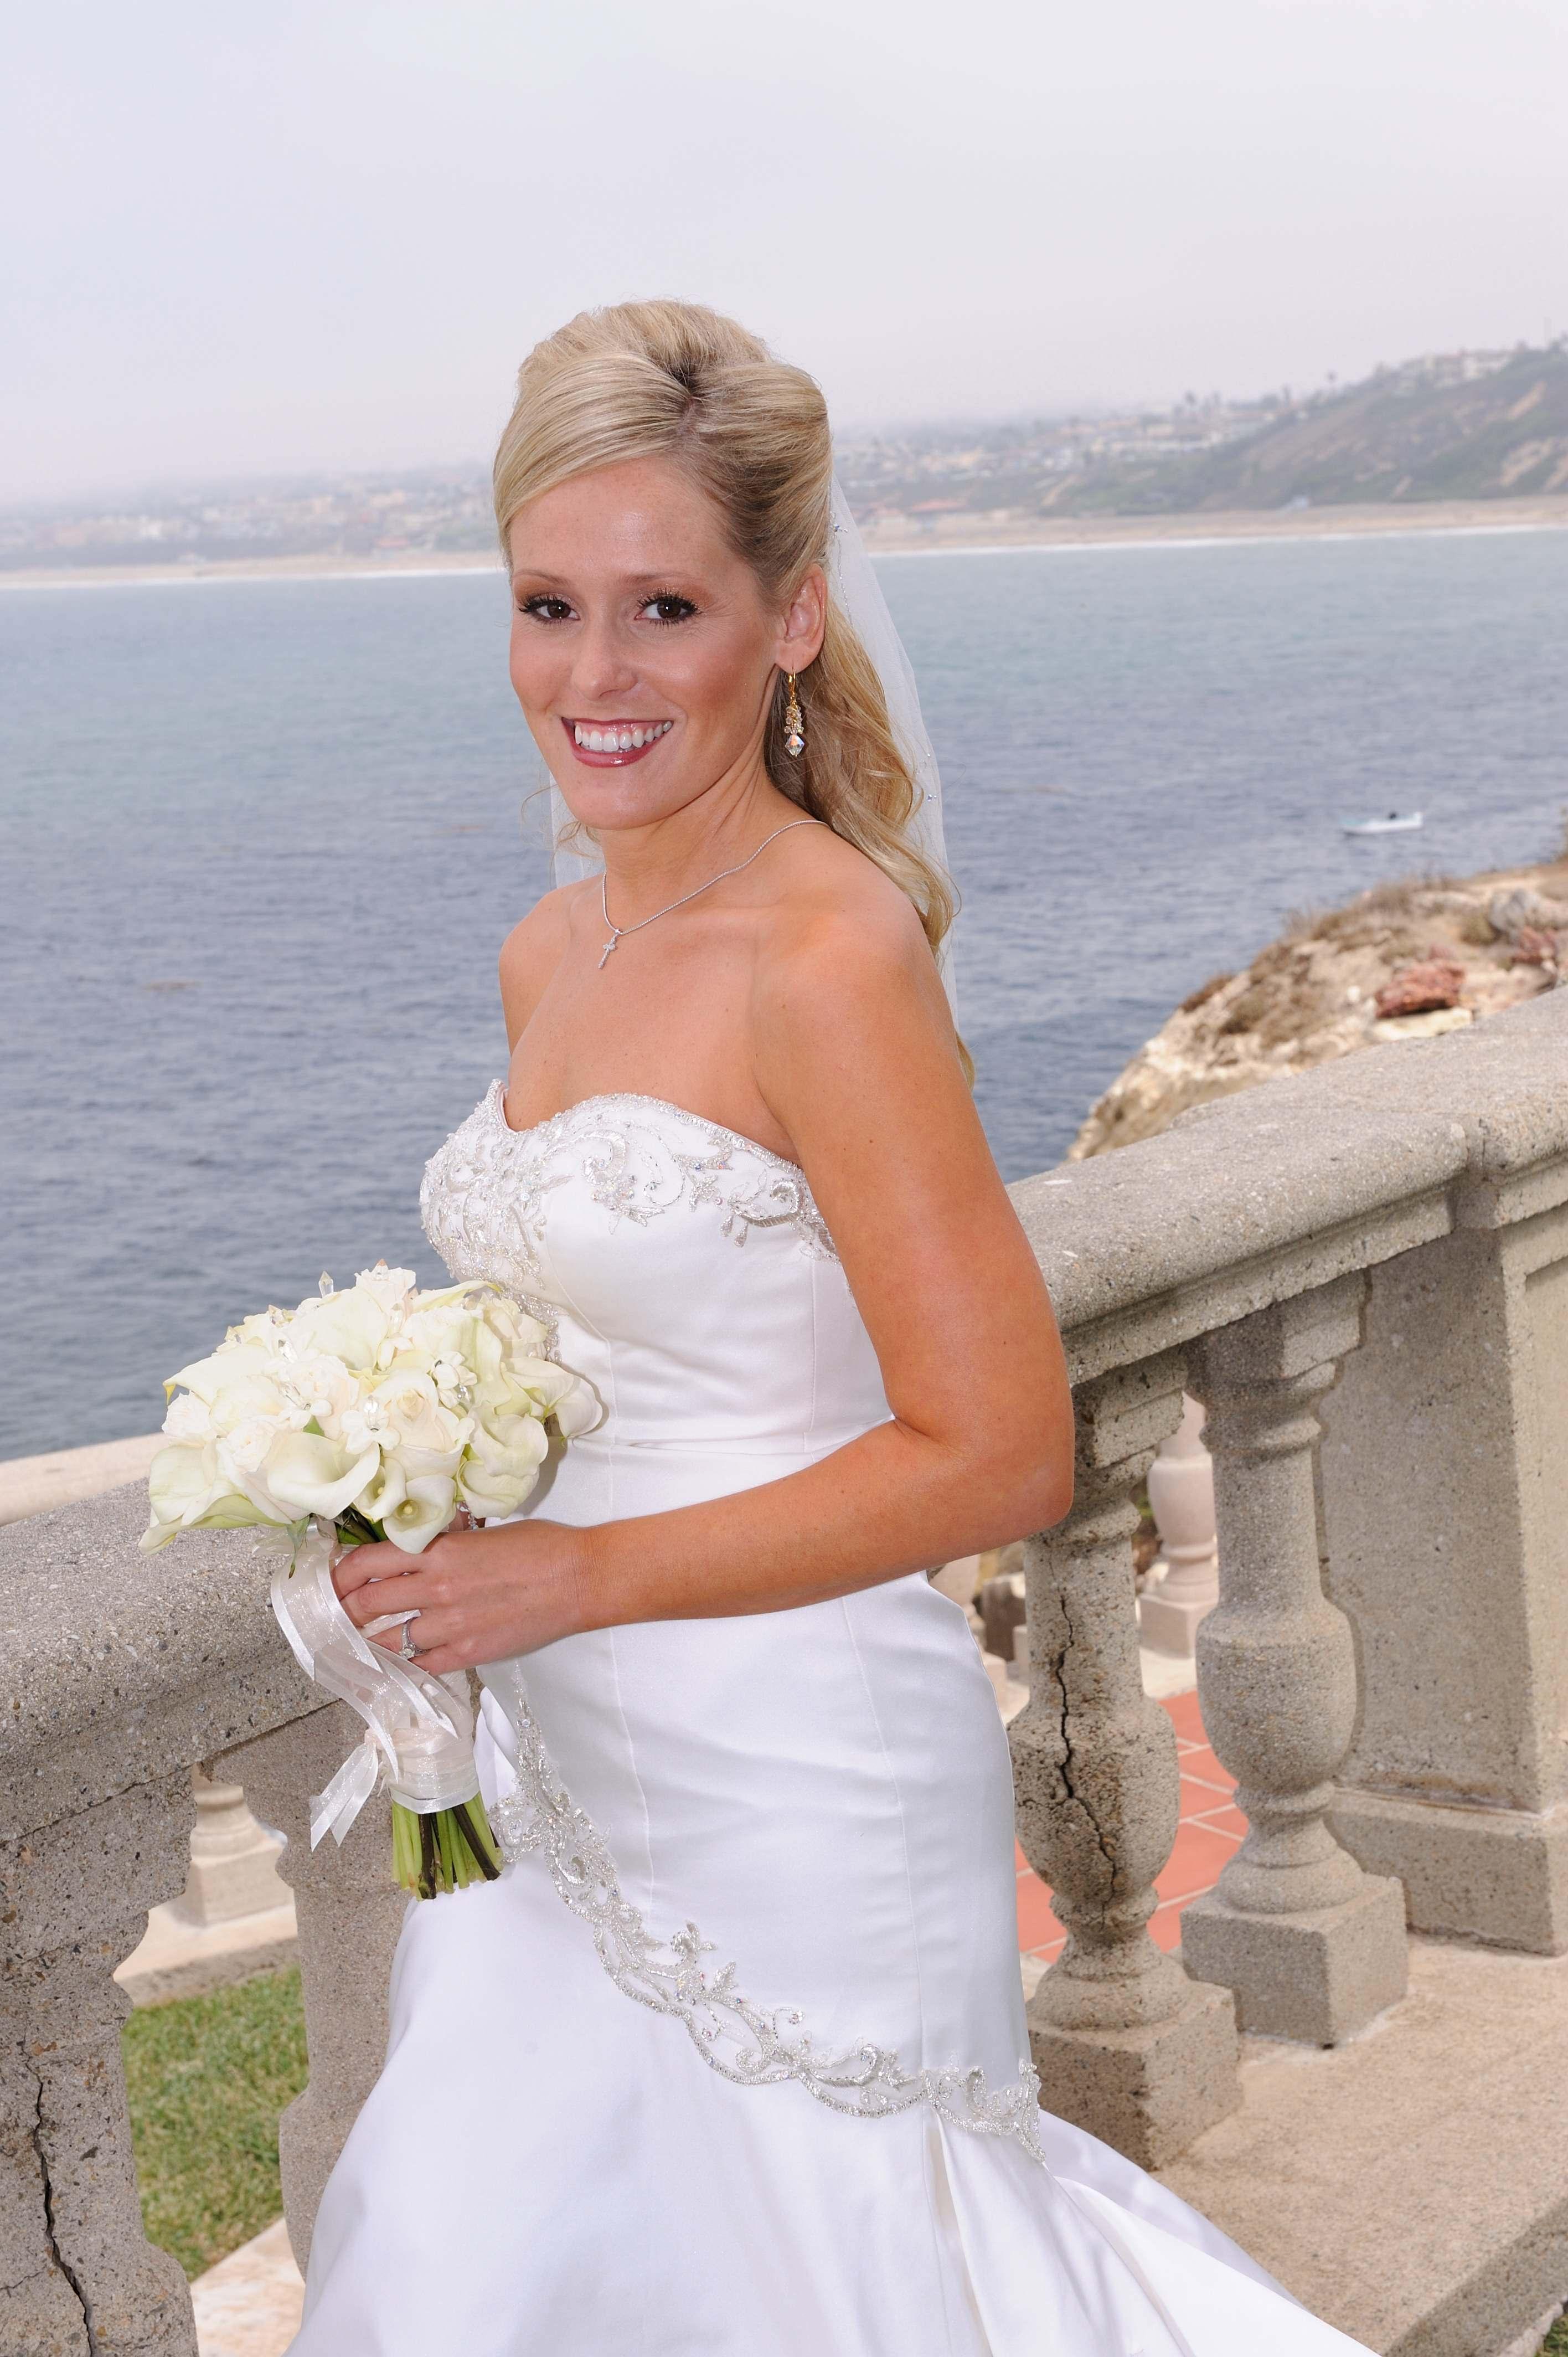 Bride, Bouquet, Ocean